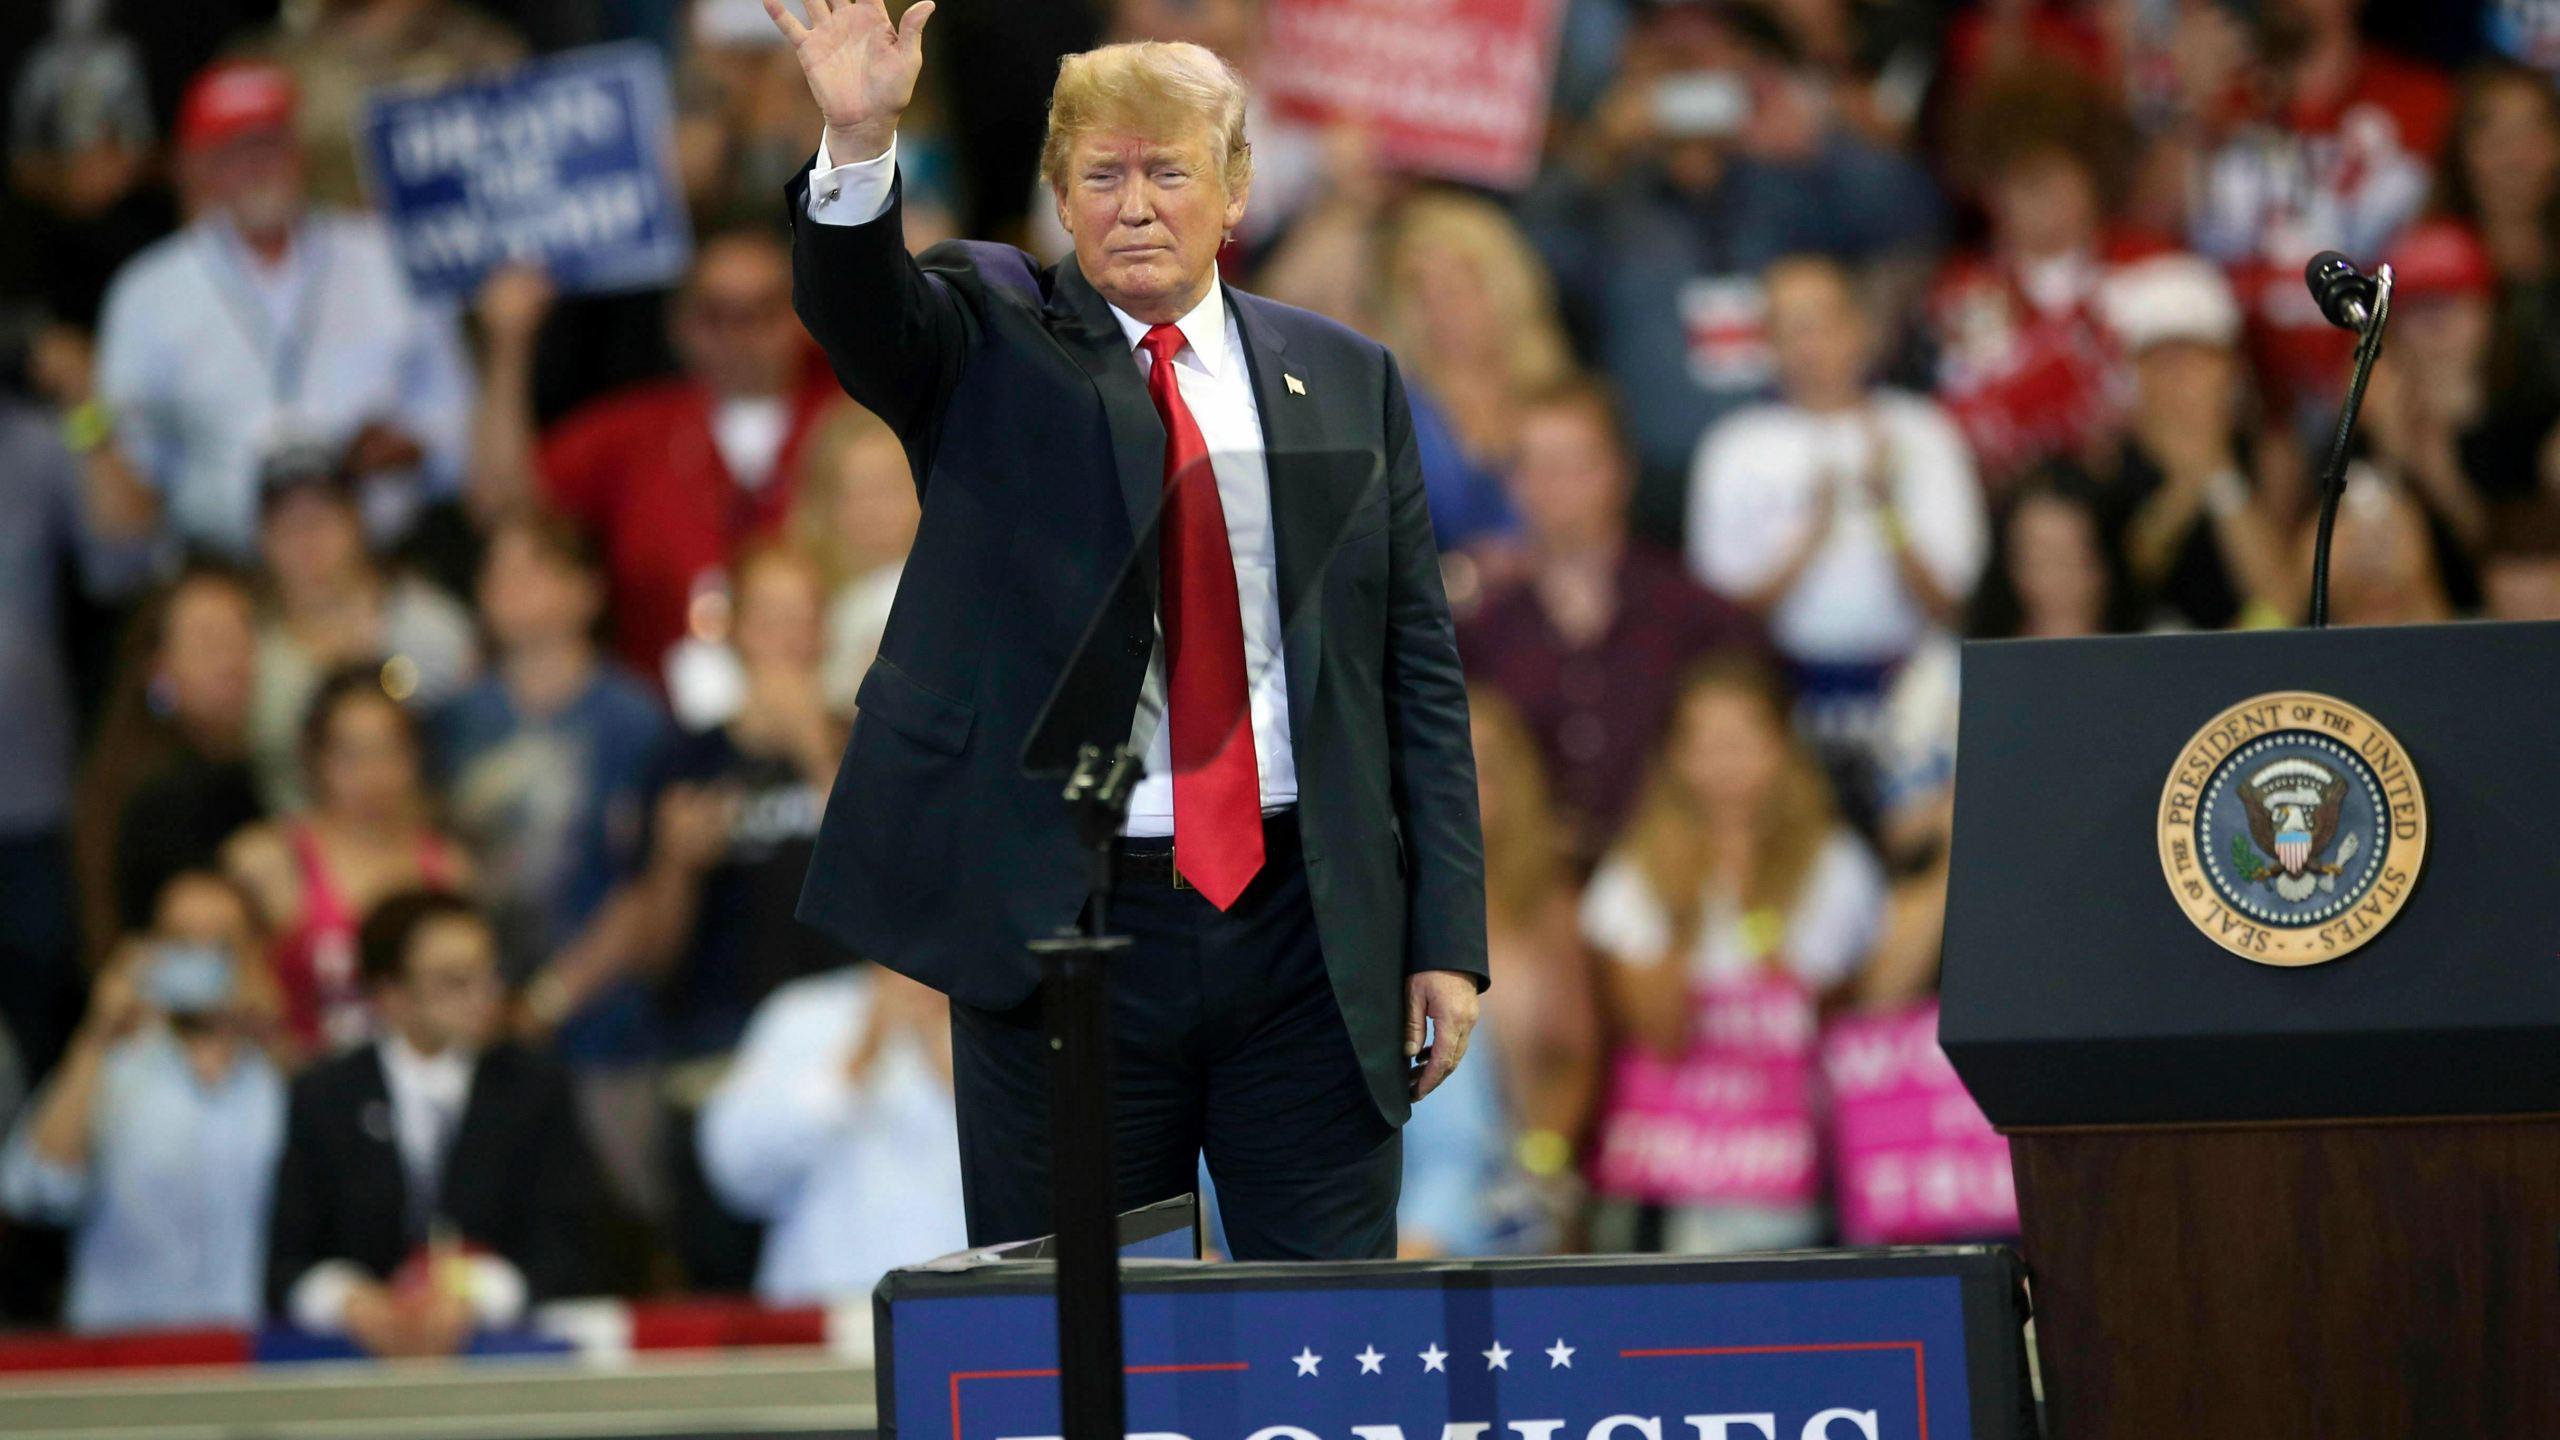 Trump_Minnesota_02395-159532.jpg79976853